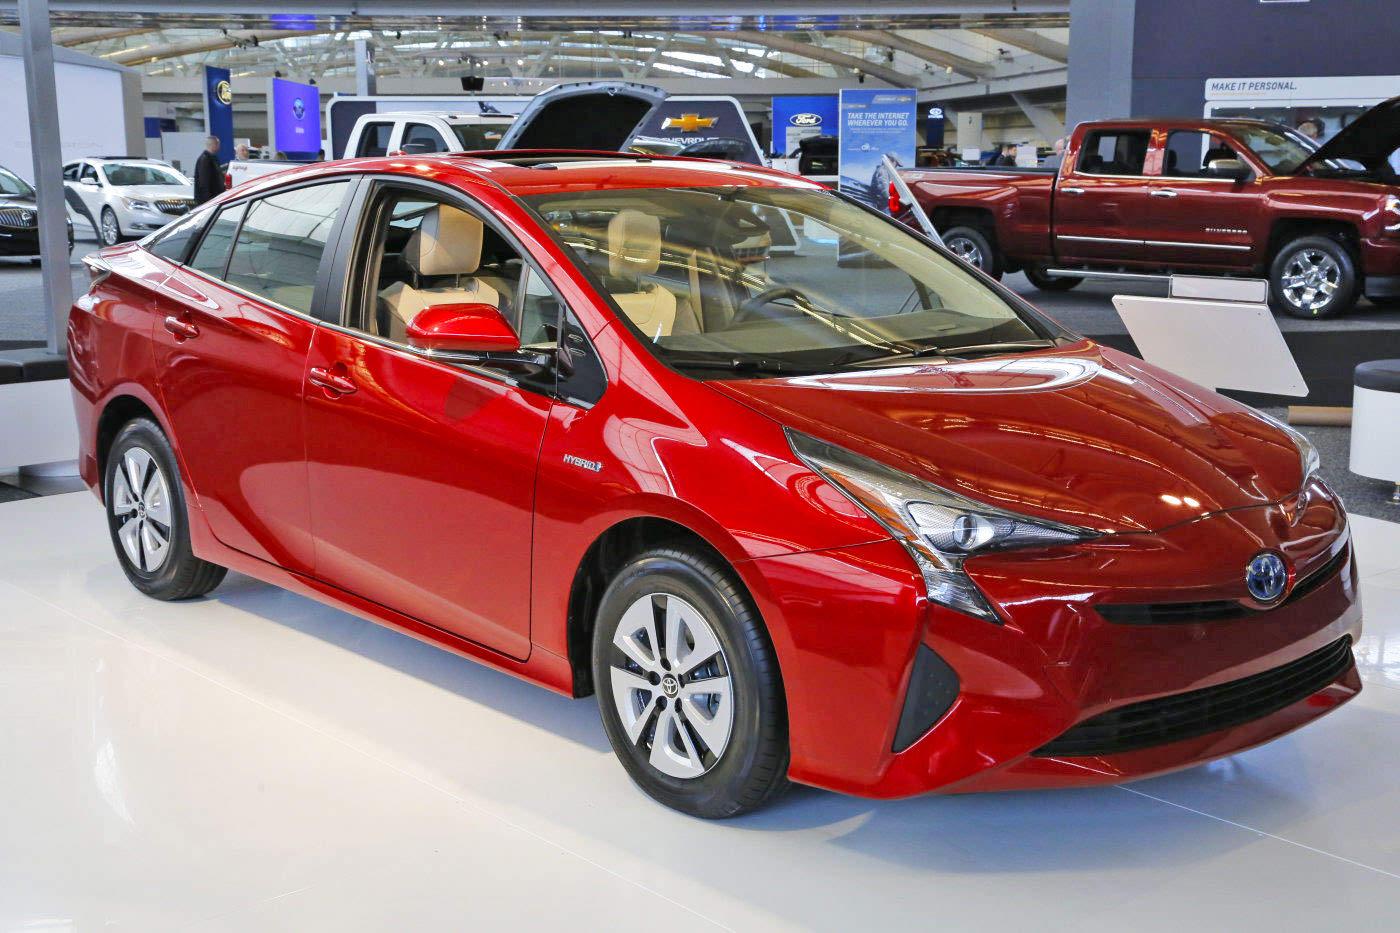 consumer reports declare toyota prius 2016 as most fuel efficient hybrid car. Black Bedroom Furniture Sets. Home Design Ideas